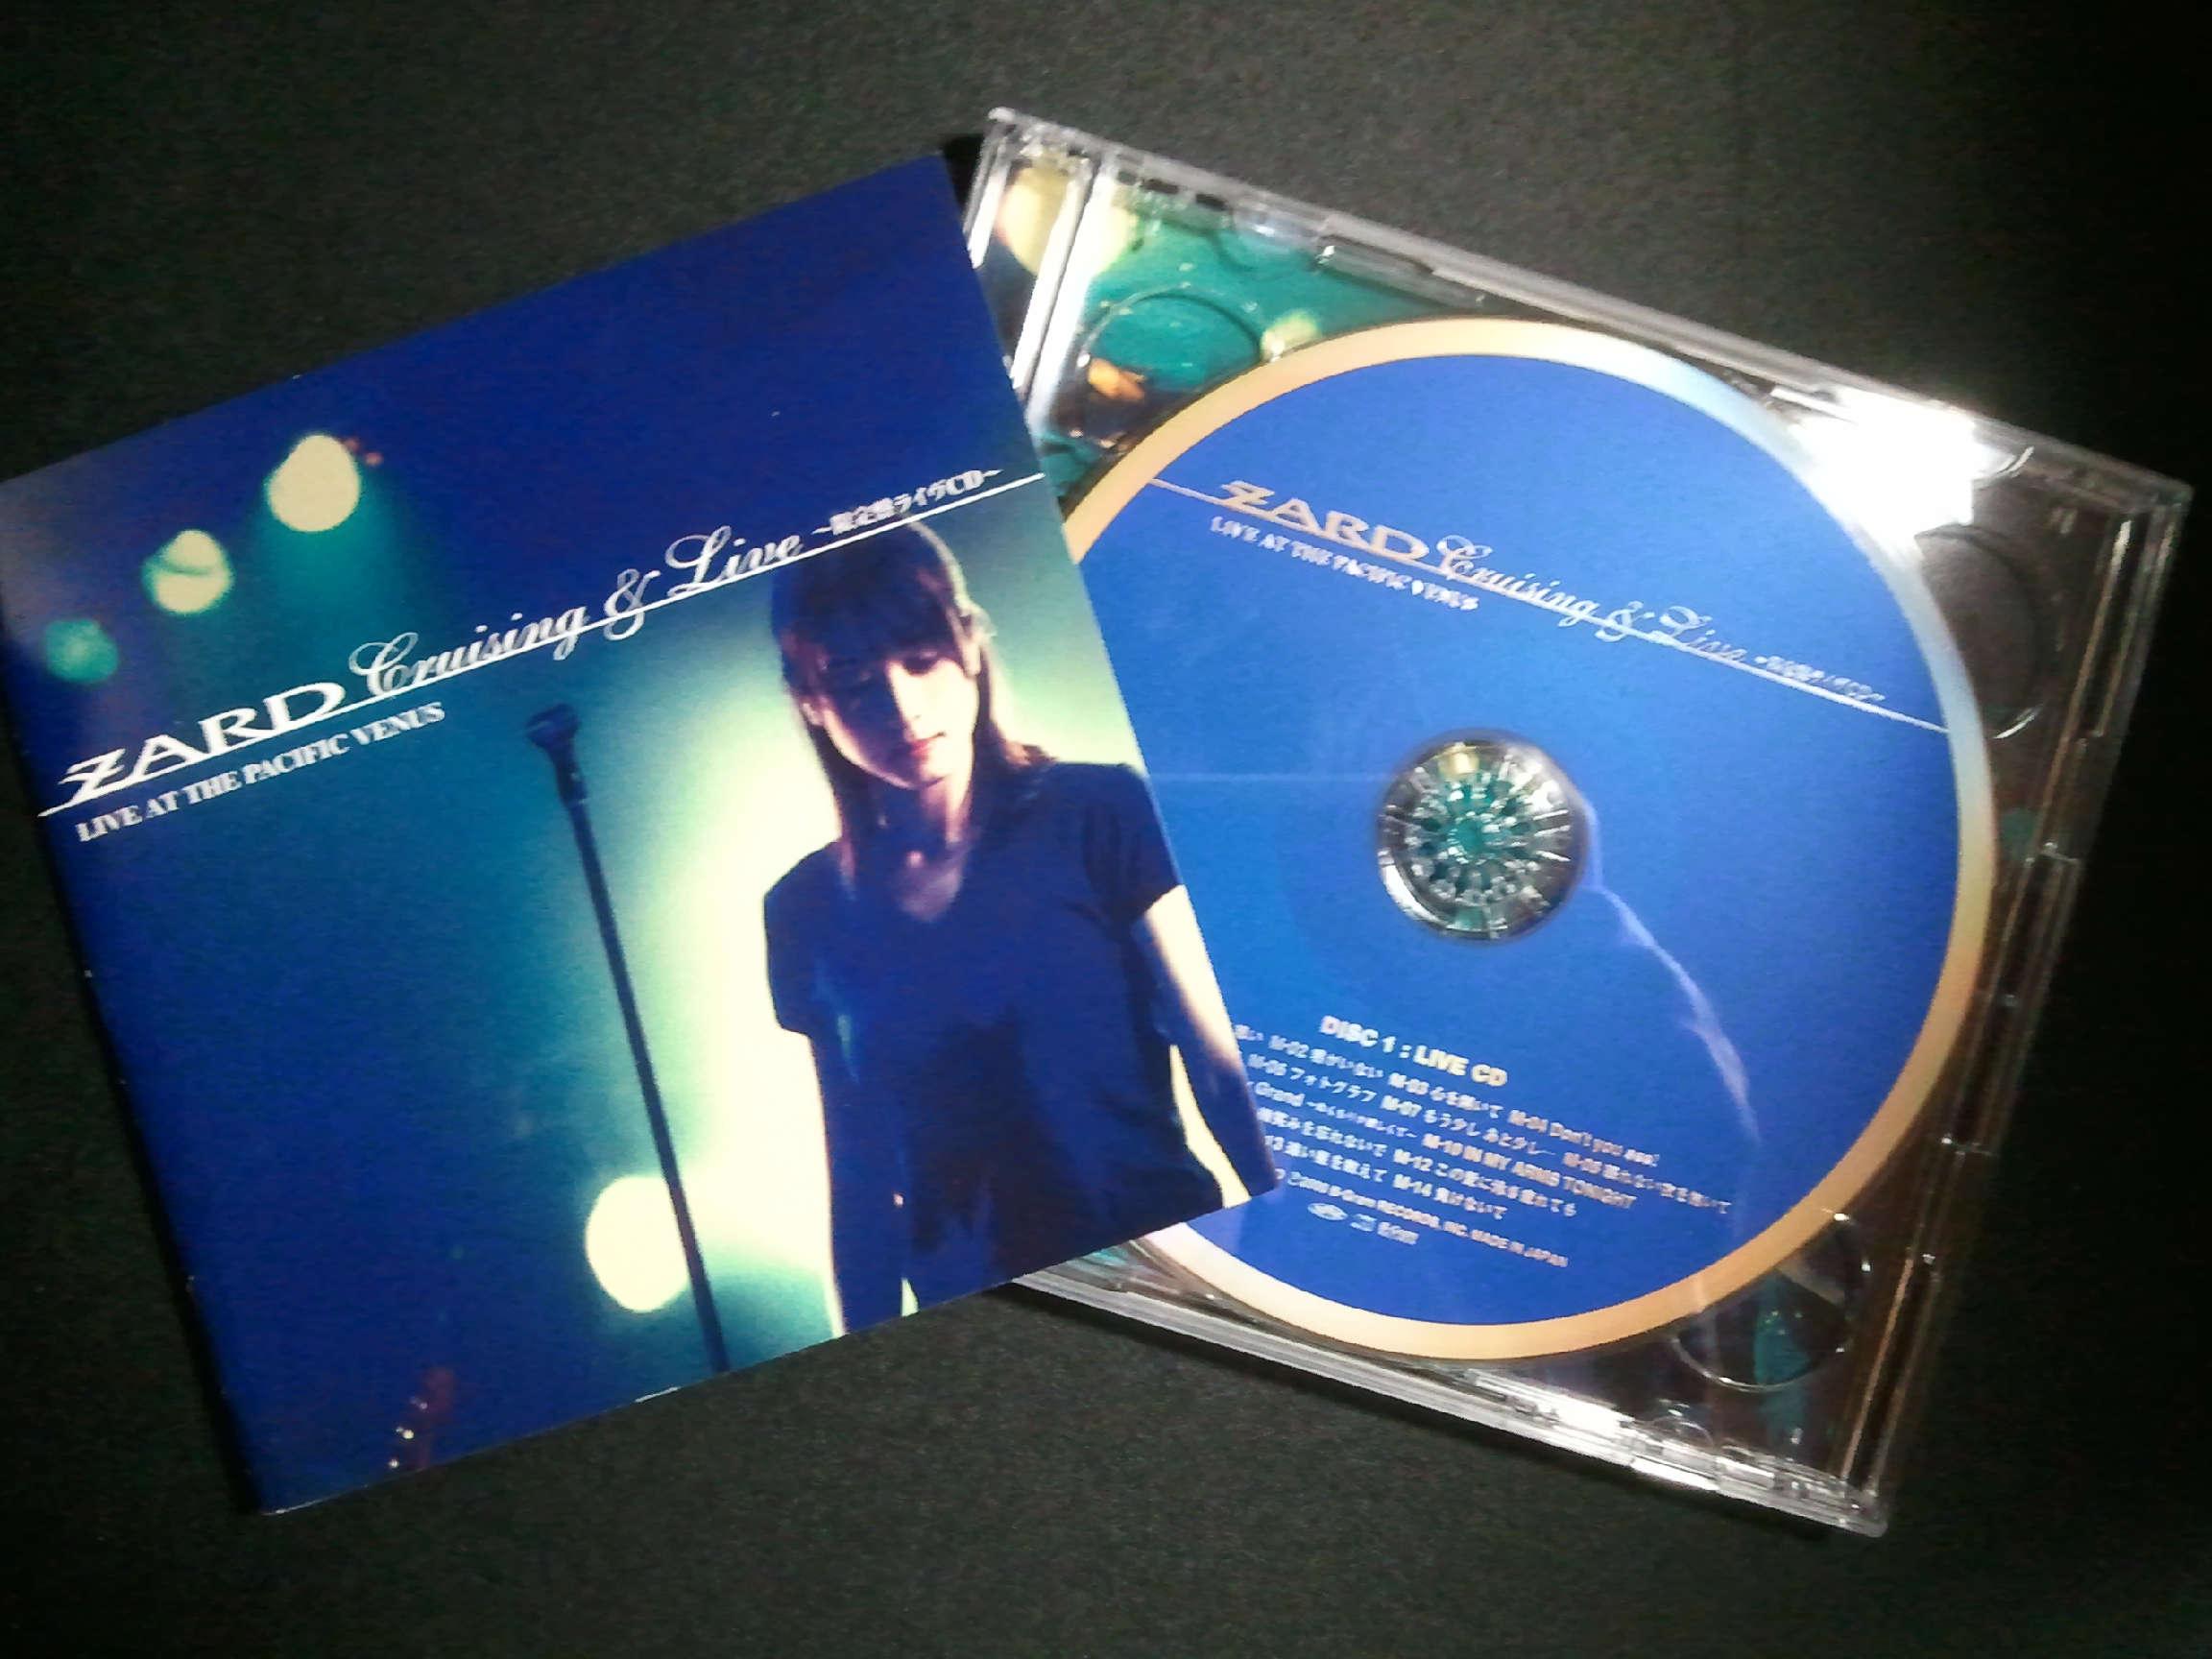 Zard Cruising & Live CD